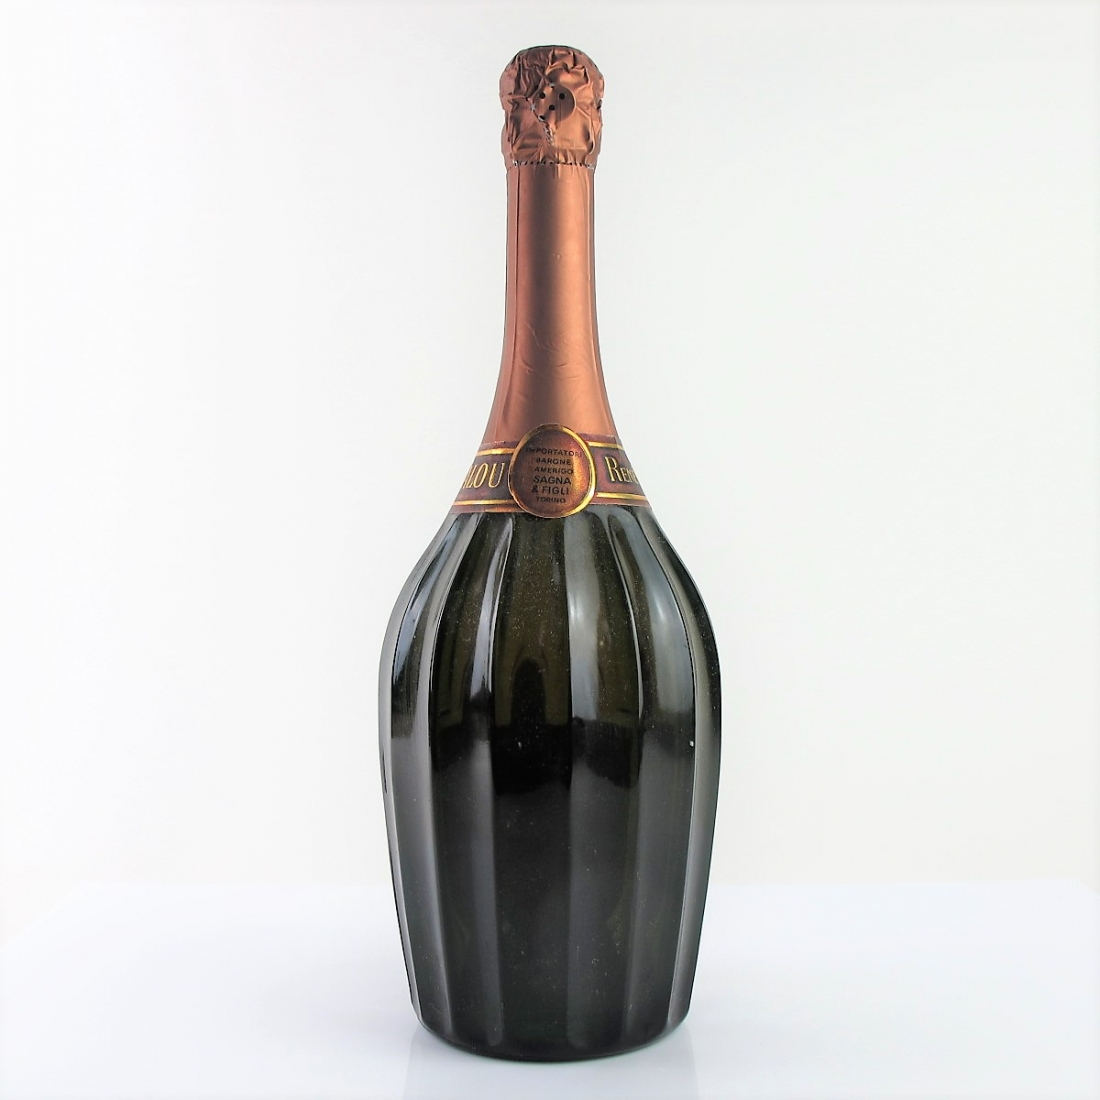 Mumm 1975 Vintage Champagne